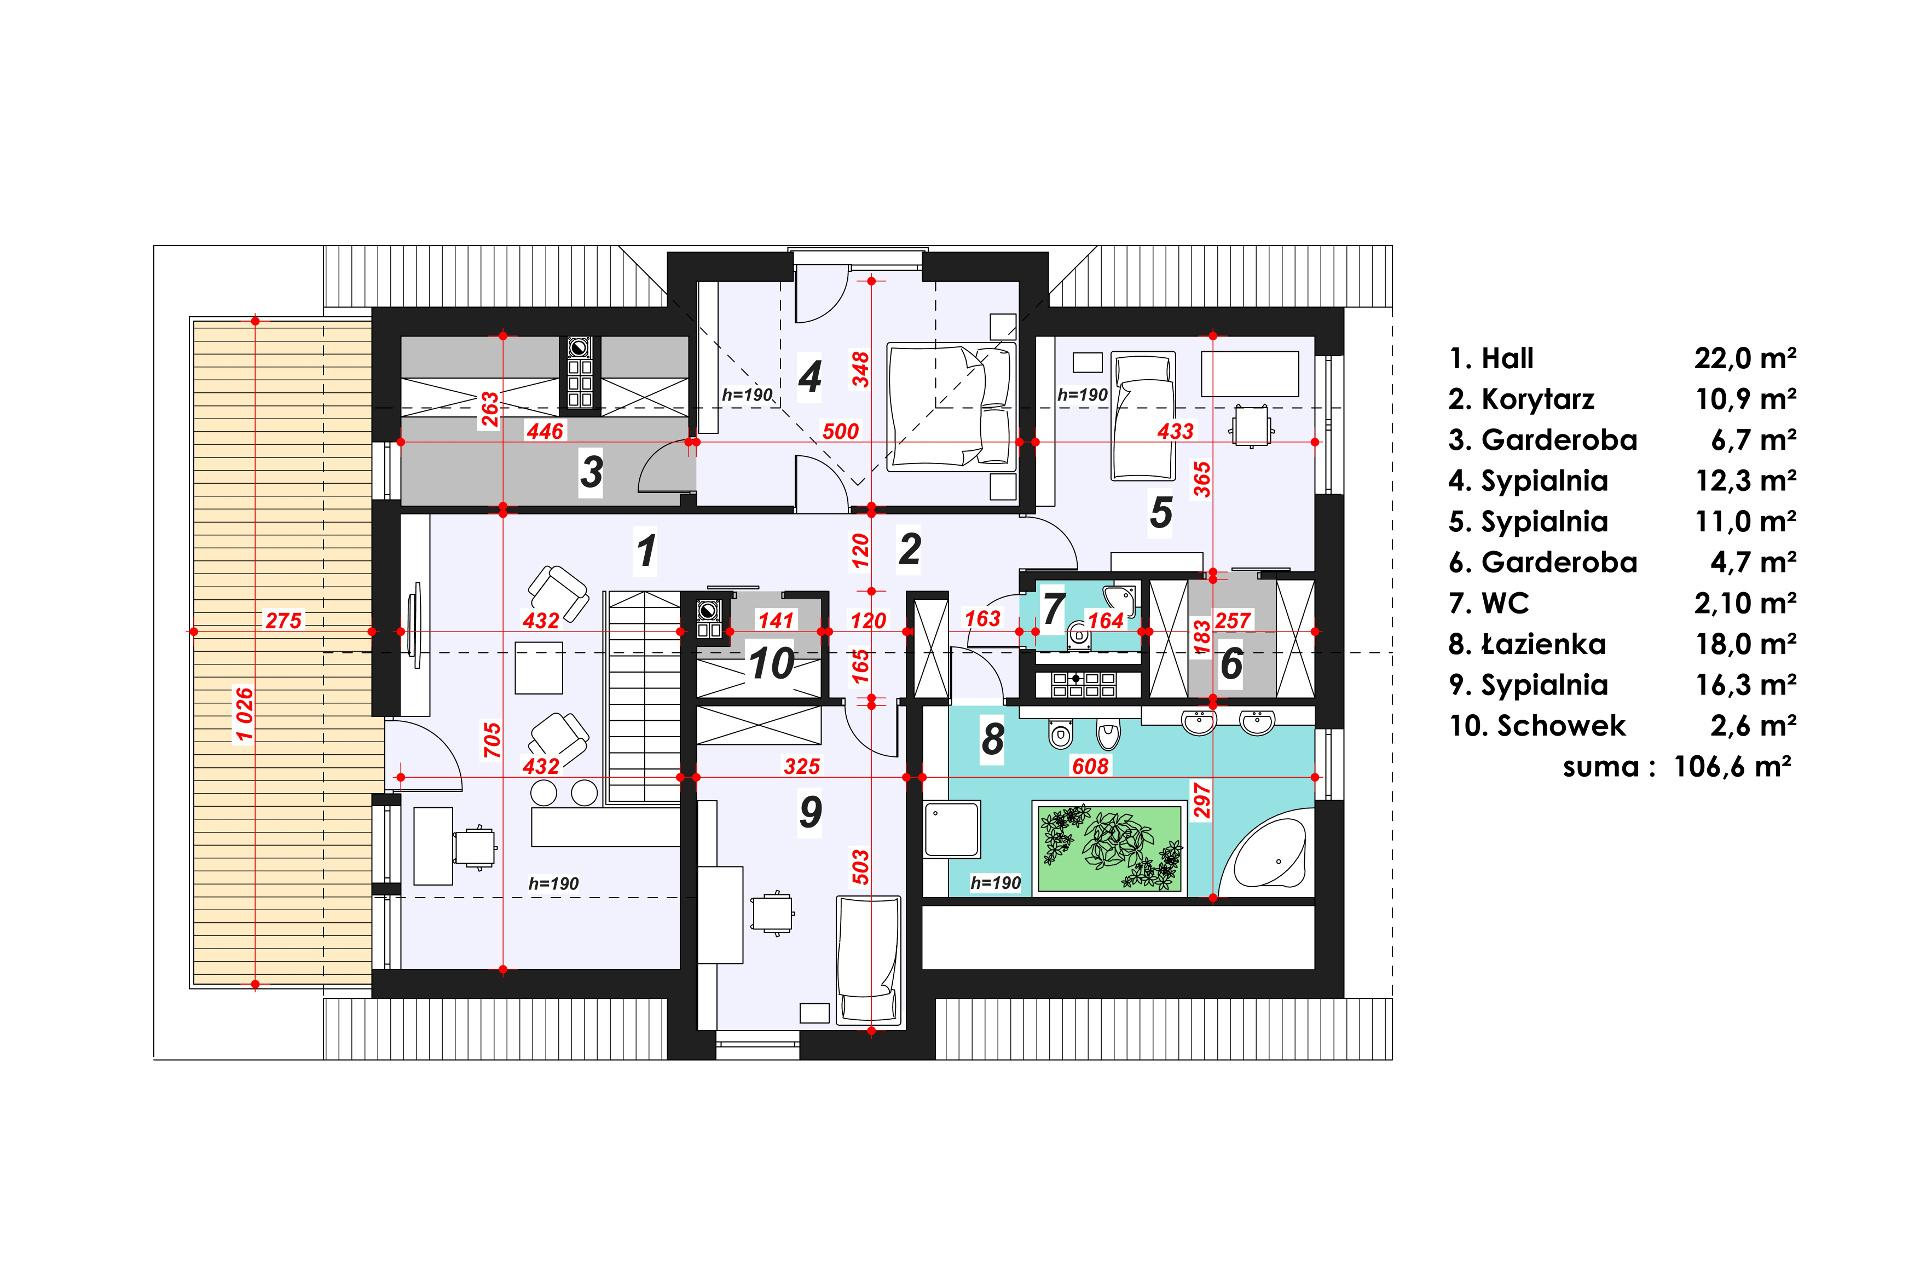 projekt-domu-rzut-poddasza-Galanseo.jpg